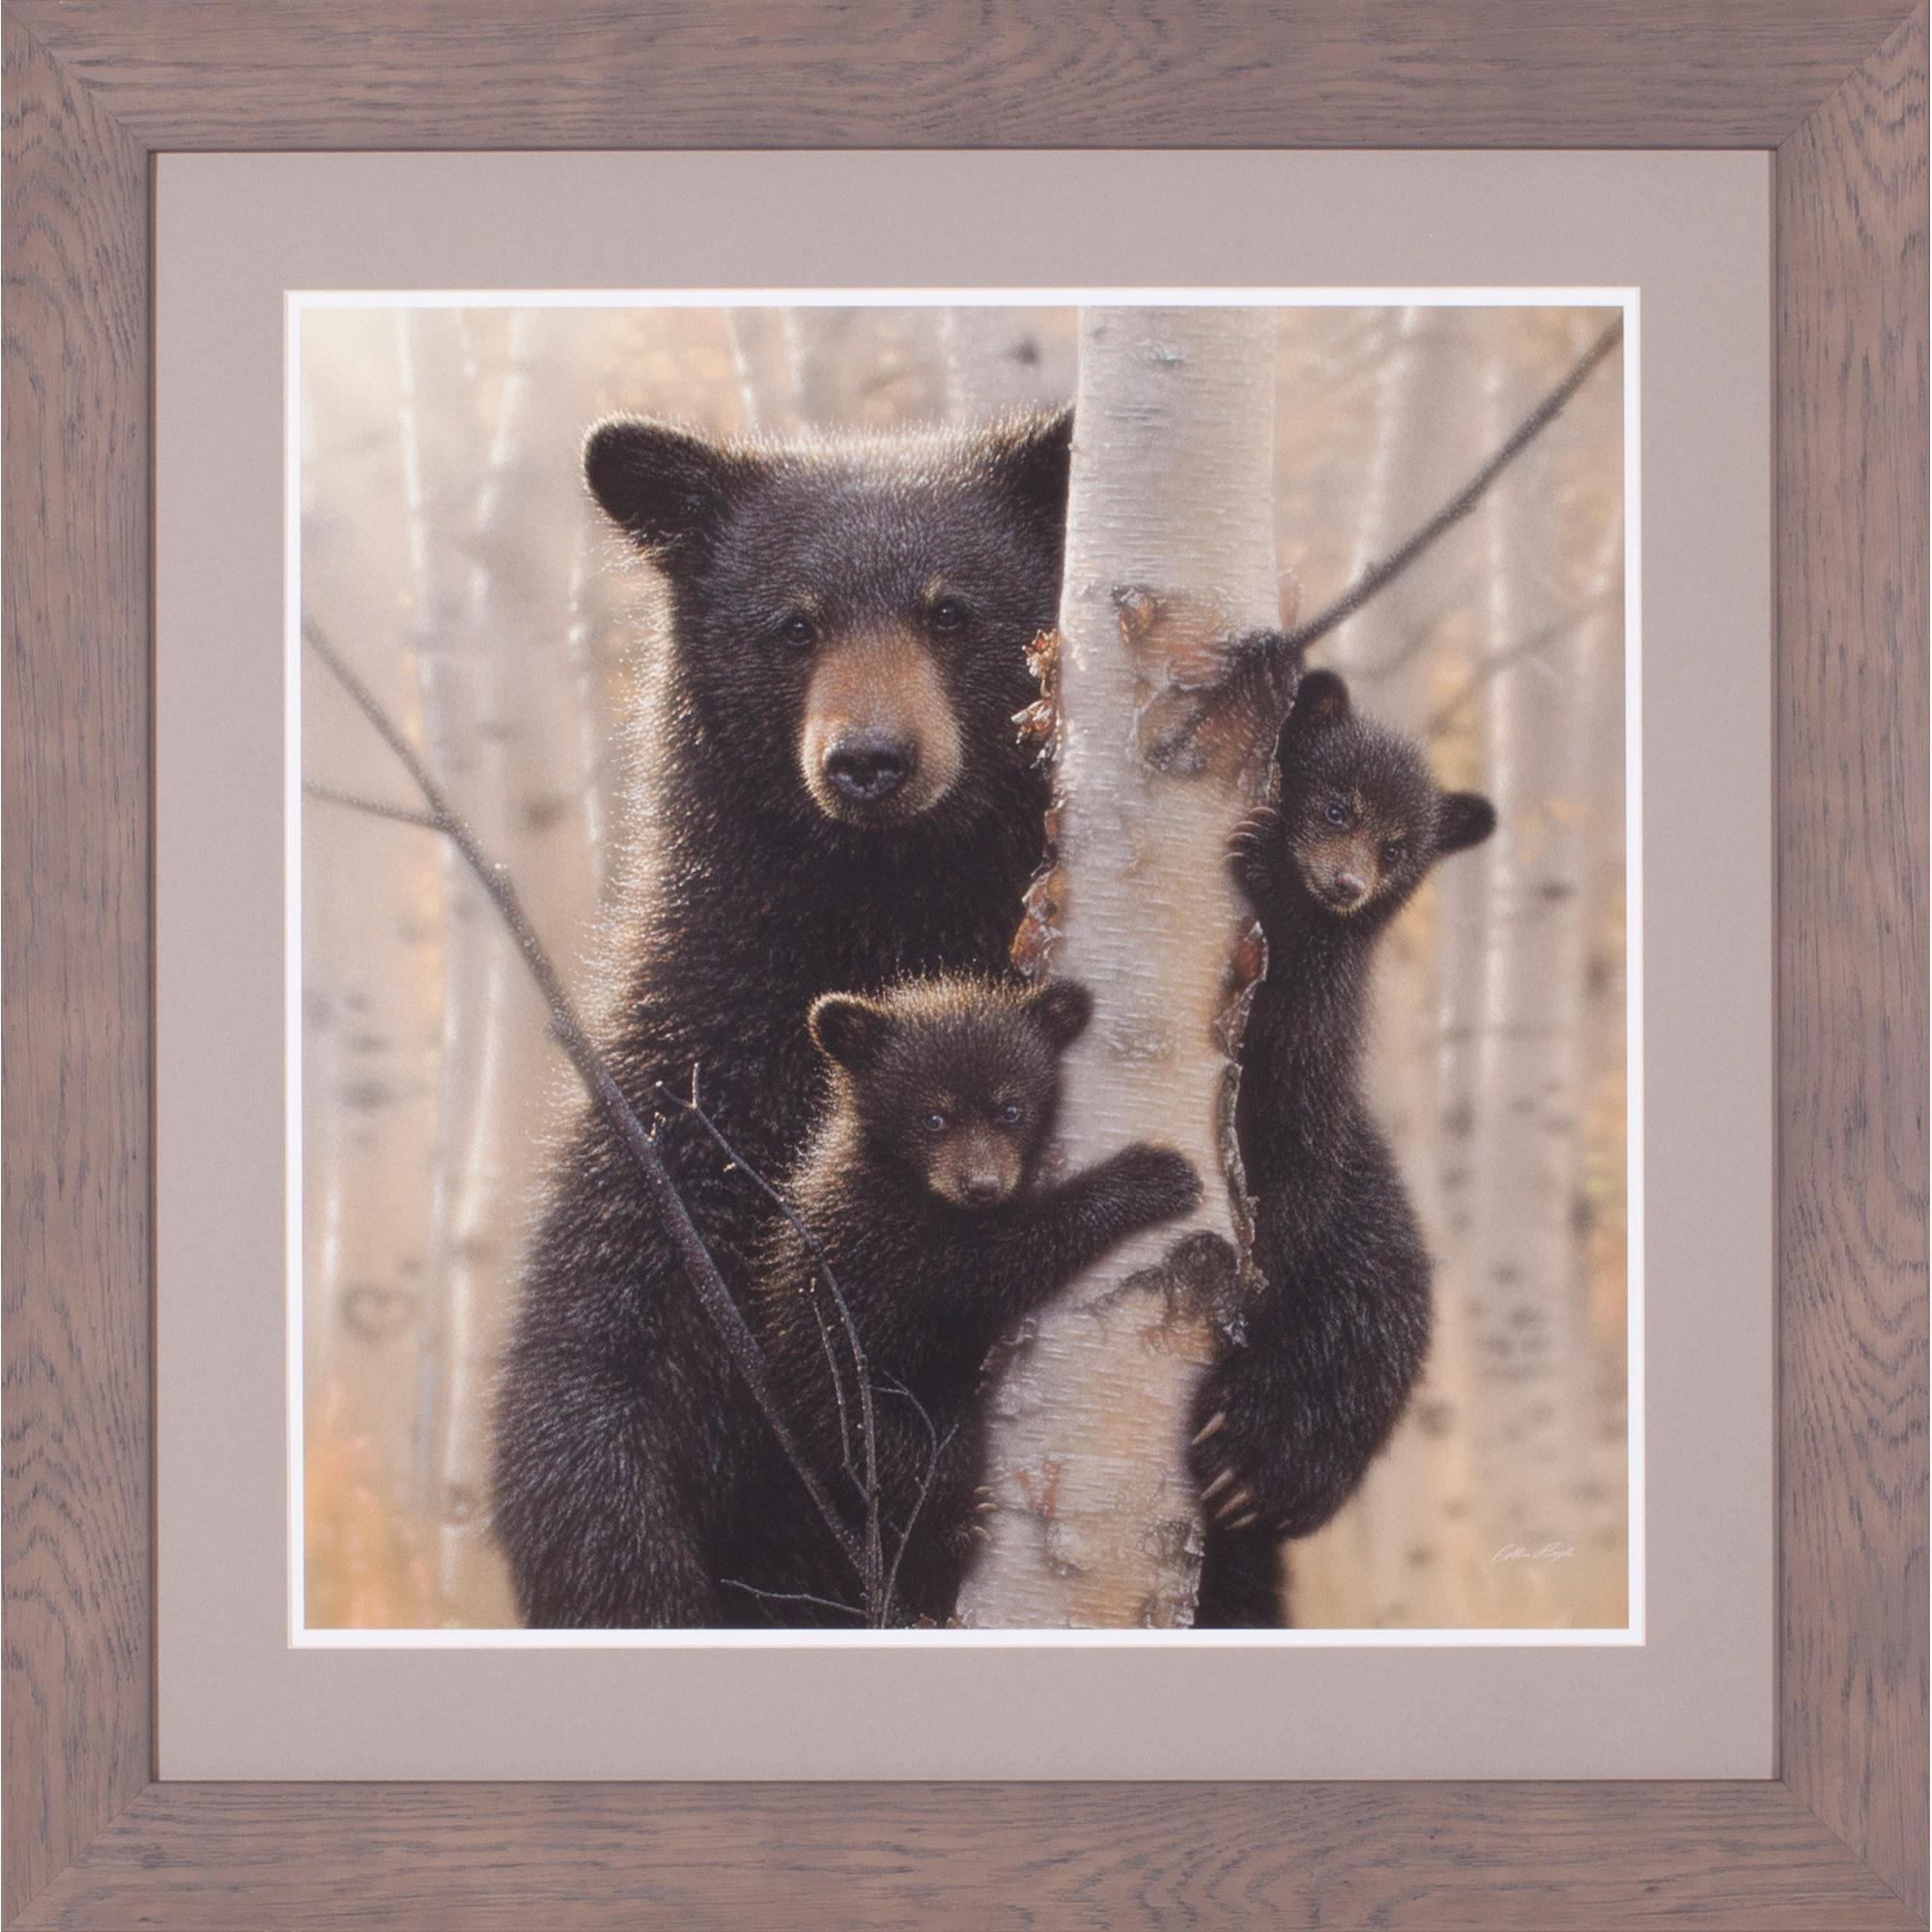 Art Effects | Black Bear Mother and Cubs Wall Art